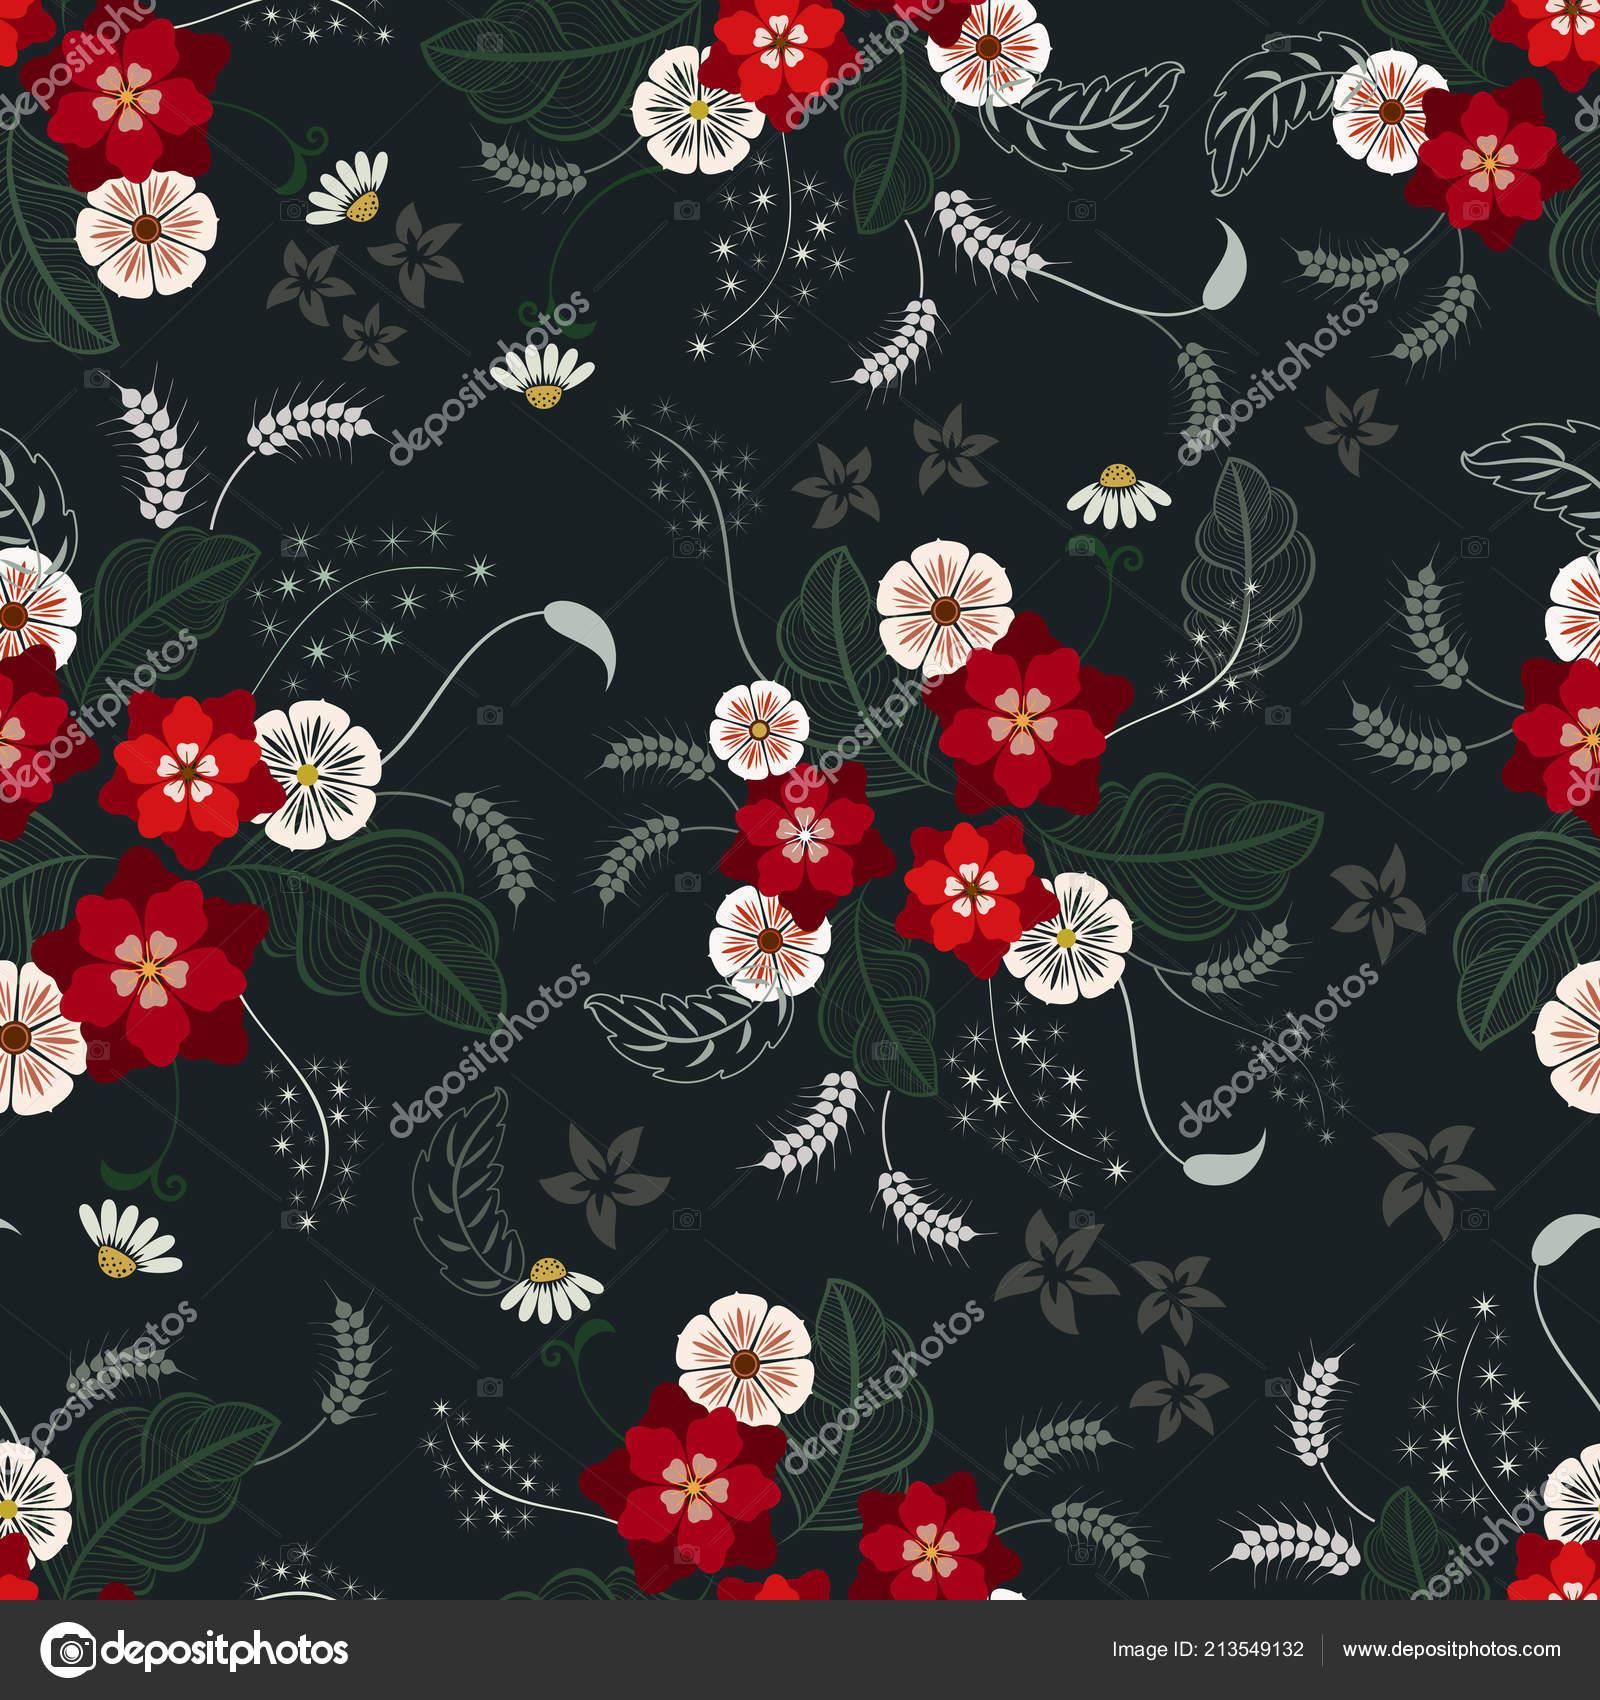 depositphotos 213549132 stock illustration seamless color flower wallpaper pattern